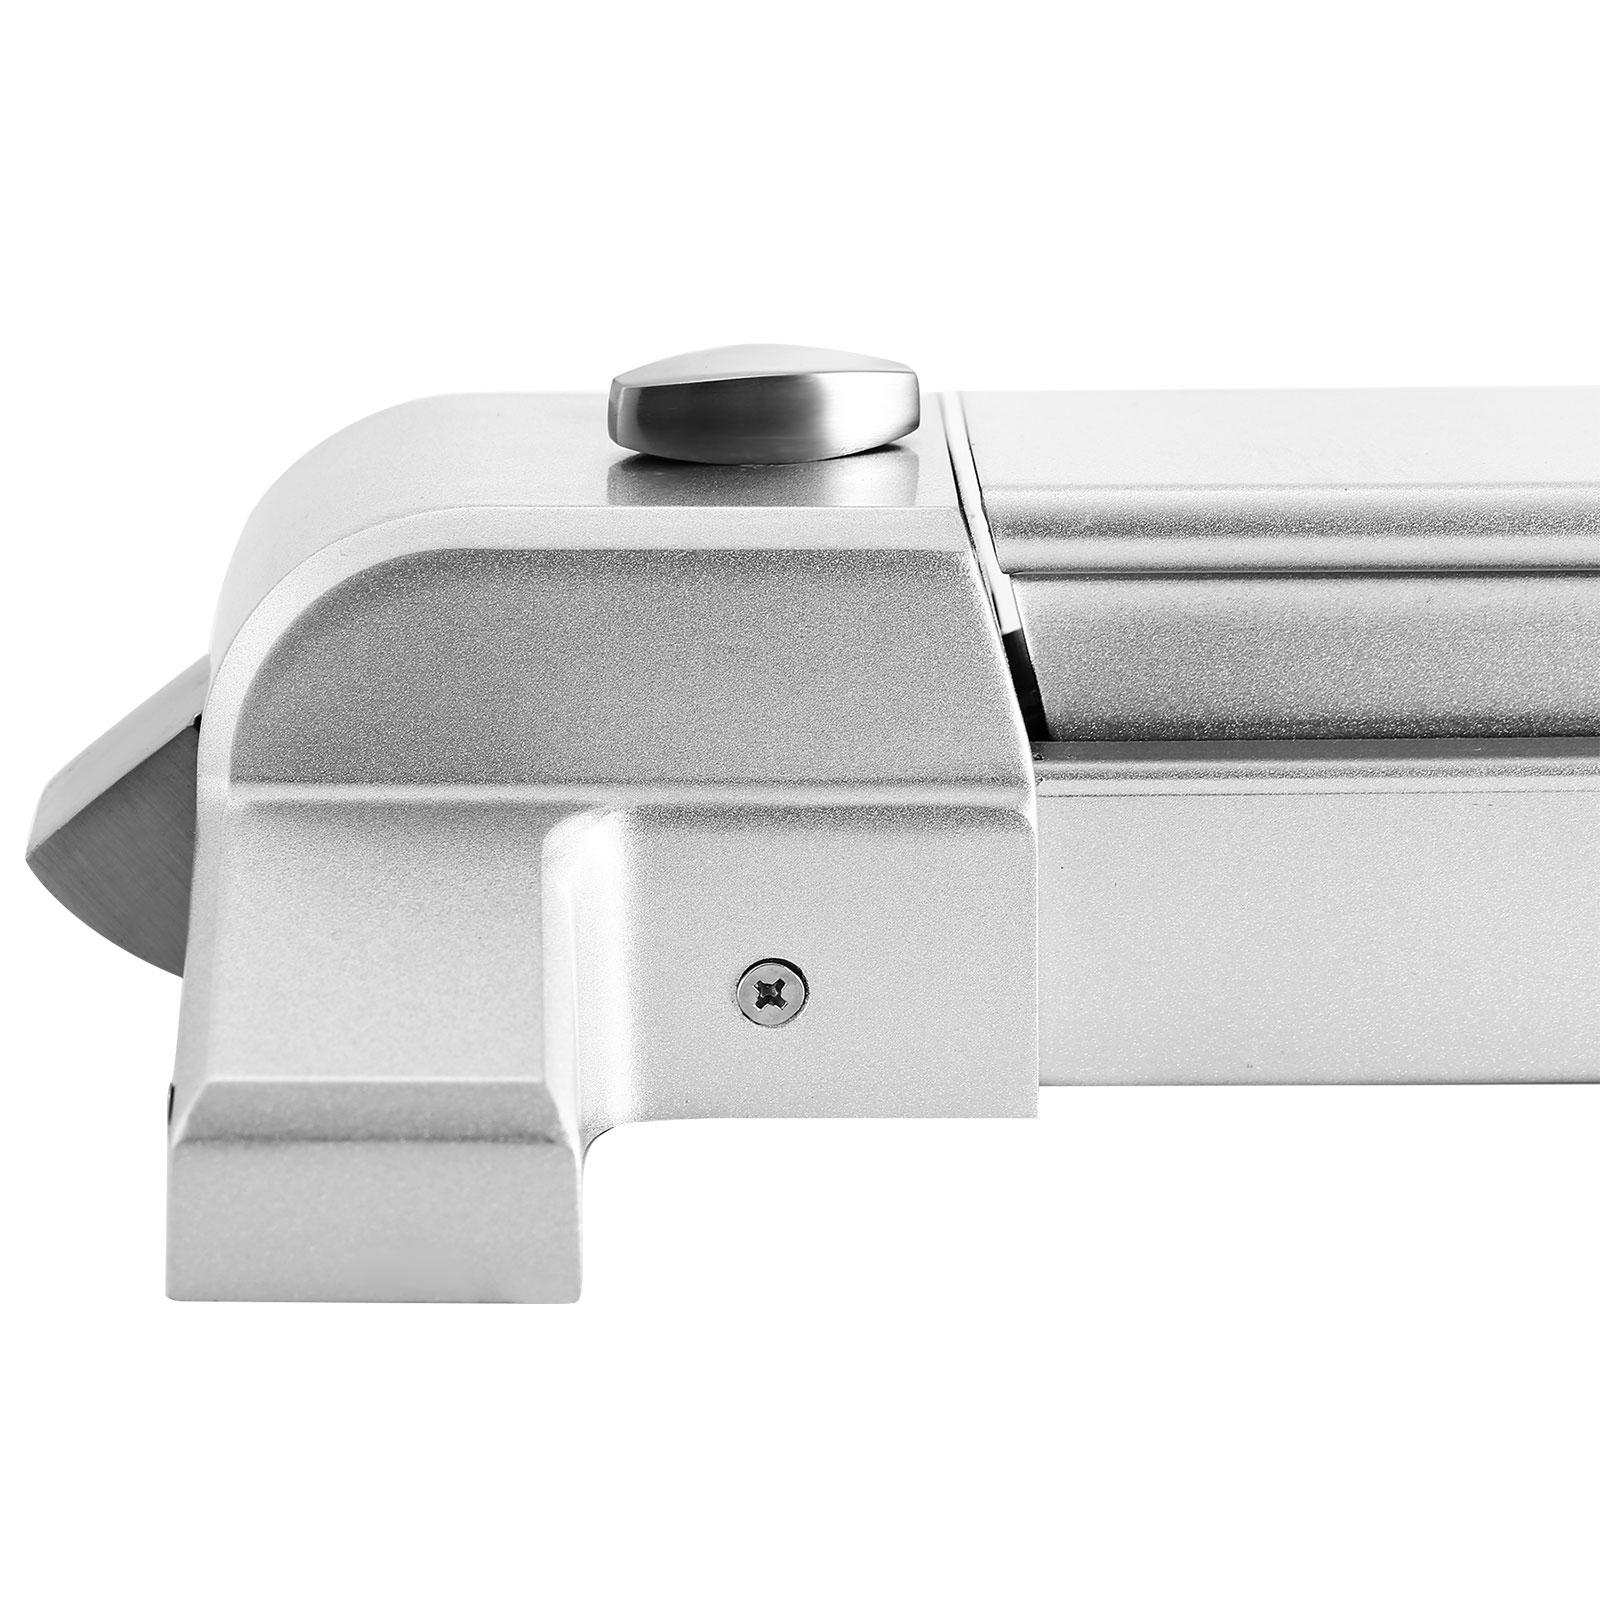 30 36 Push Bar Door Exit Device Lock Hardware Latch Hq Escape Commercial Ebay